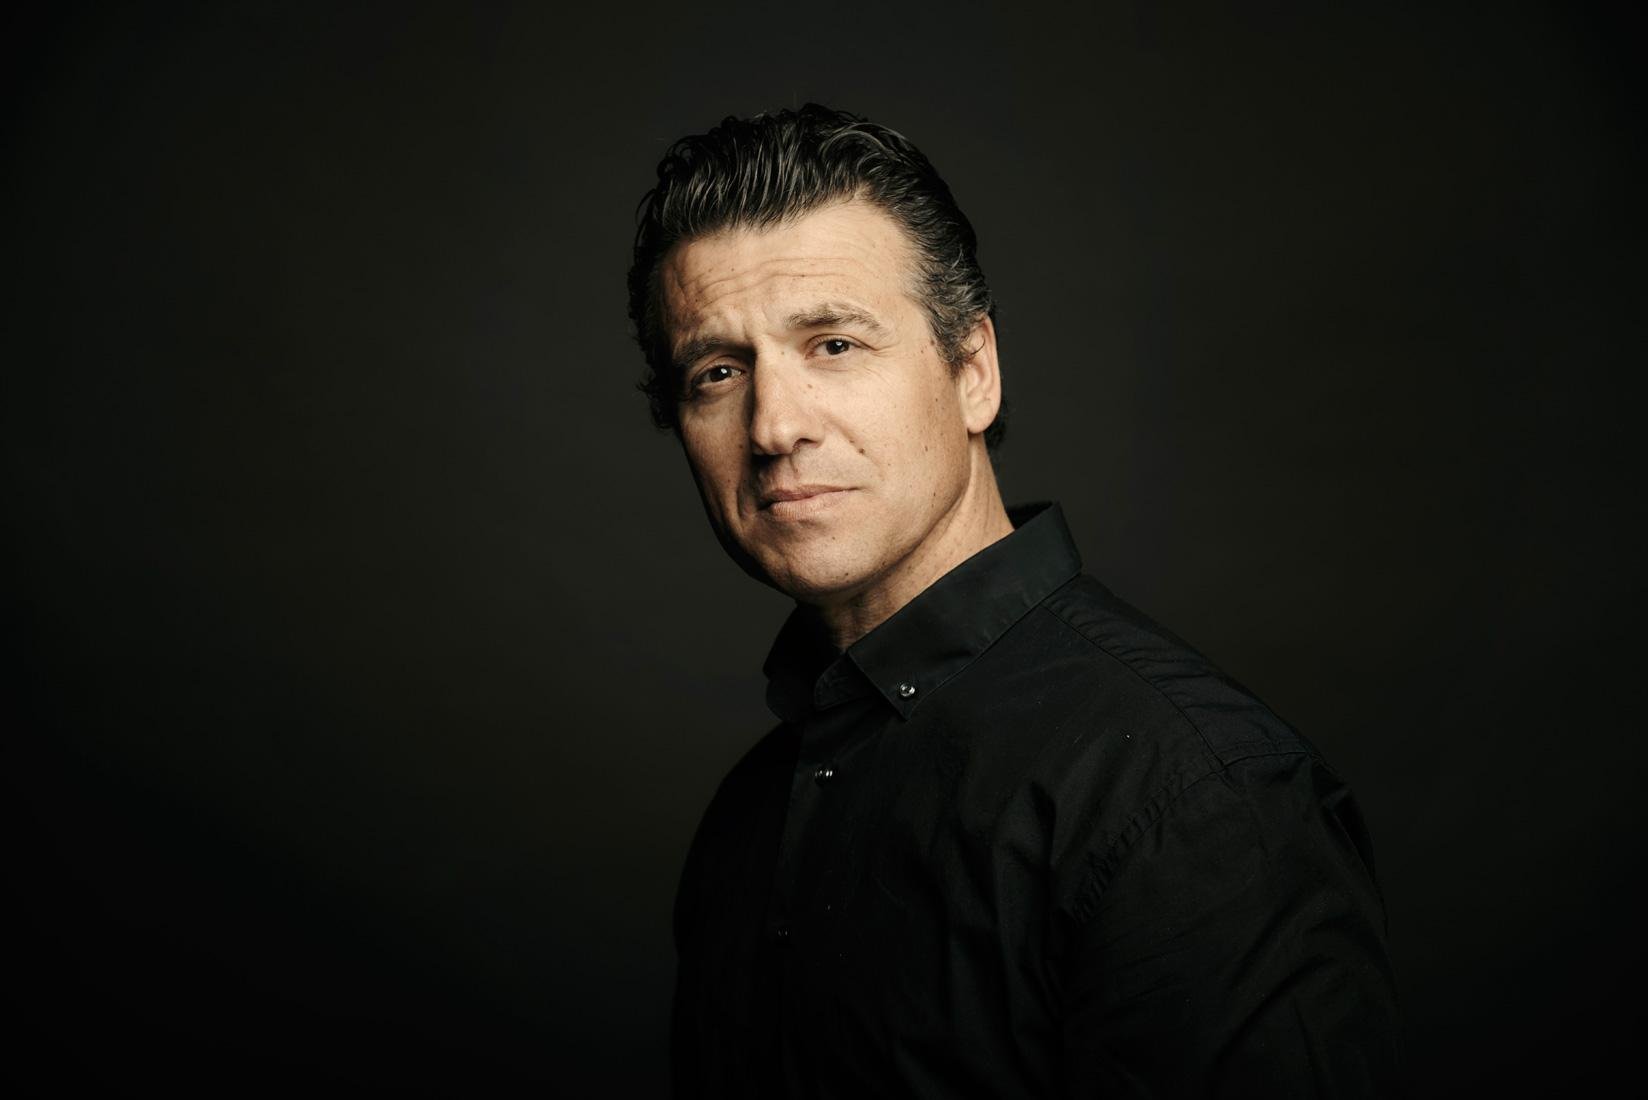 DanielMuñoz